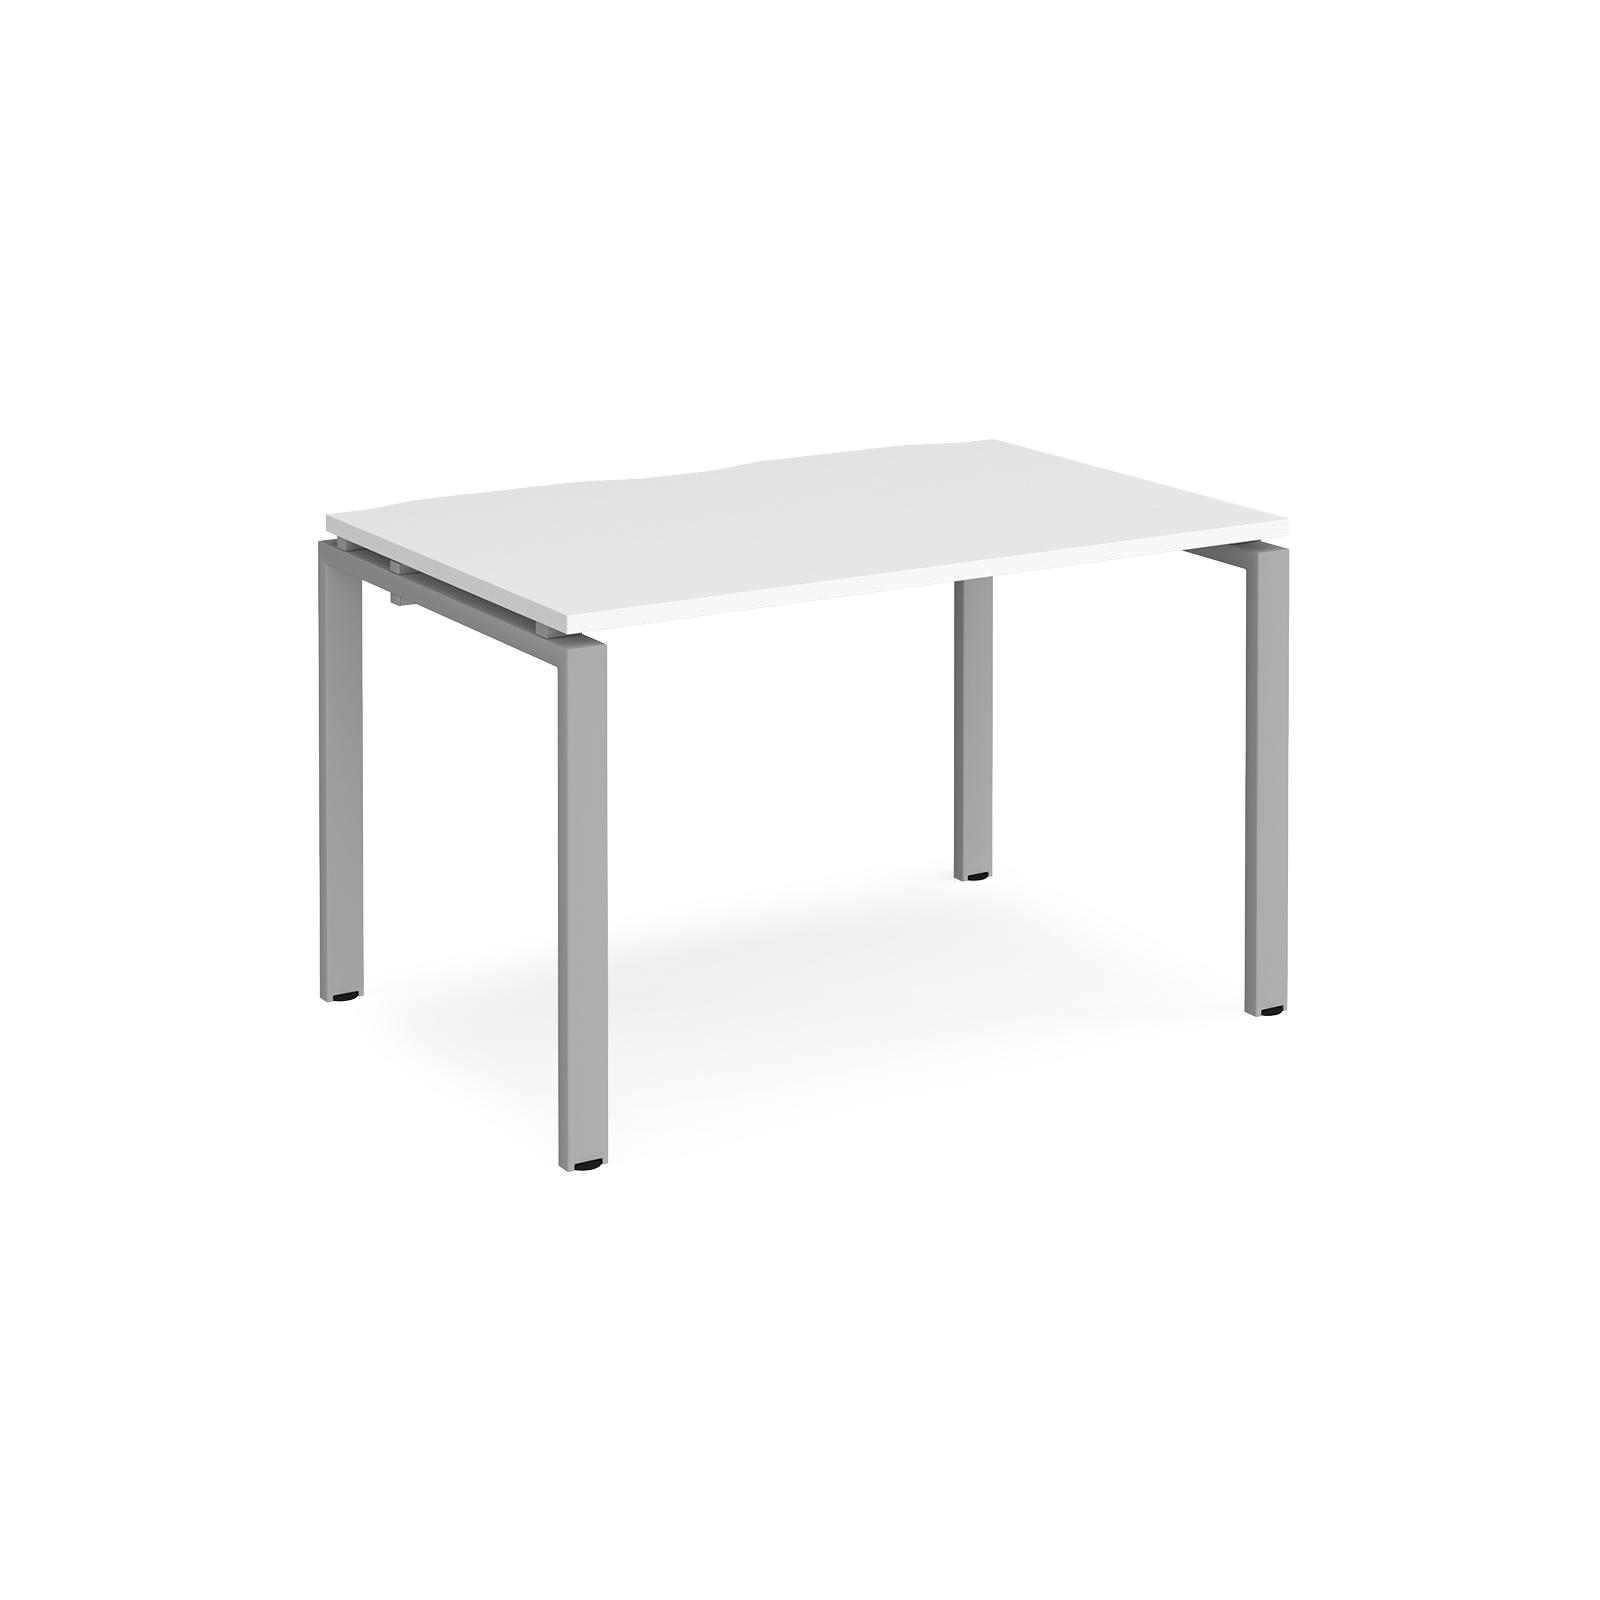 Adapt II Single Desk 1200mm x 800mm - Silver Frame, White Top